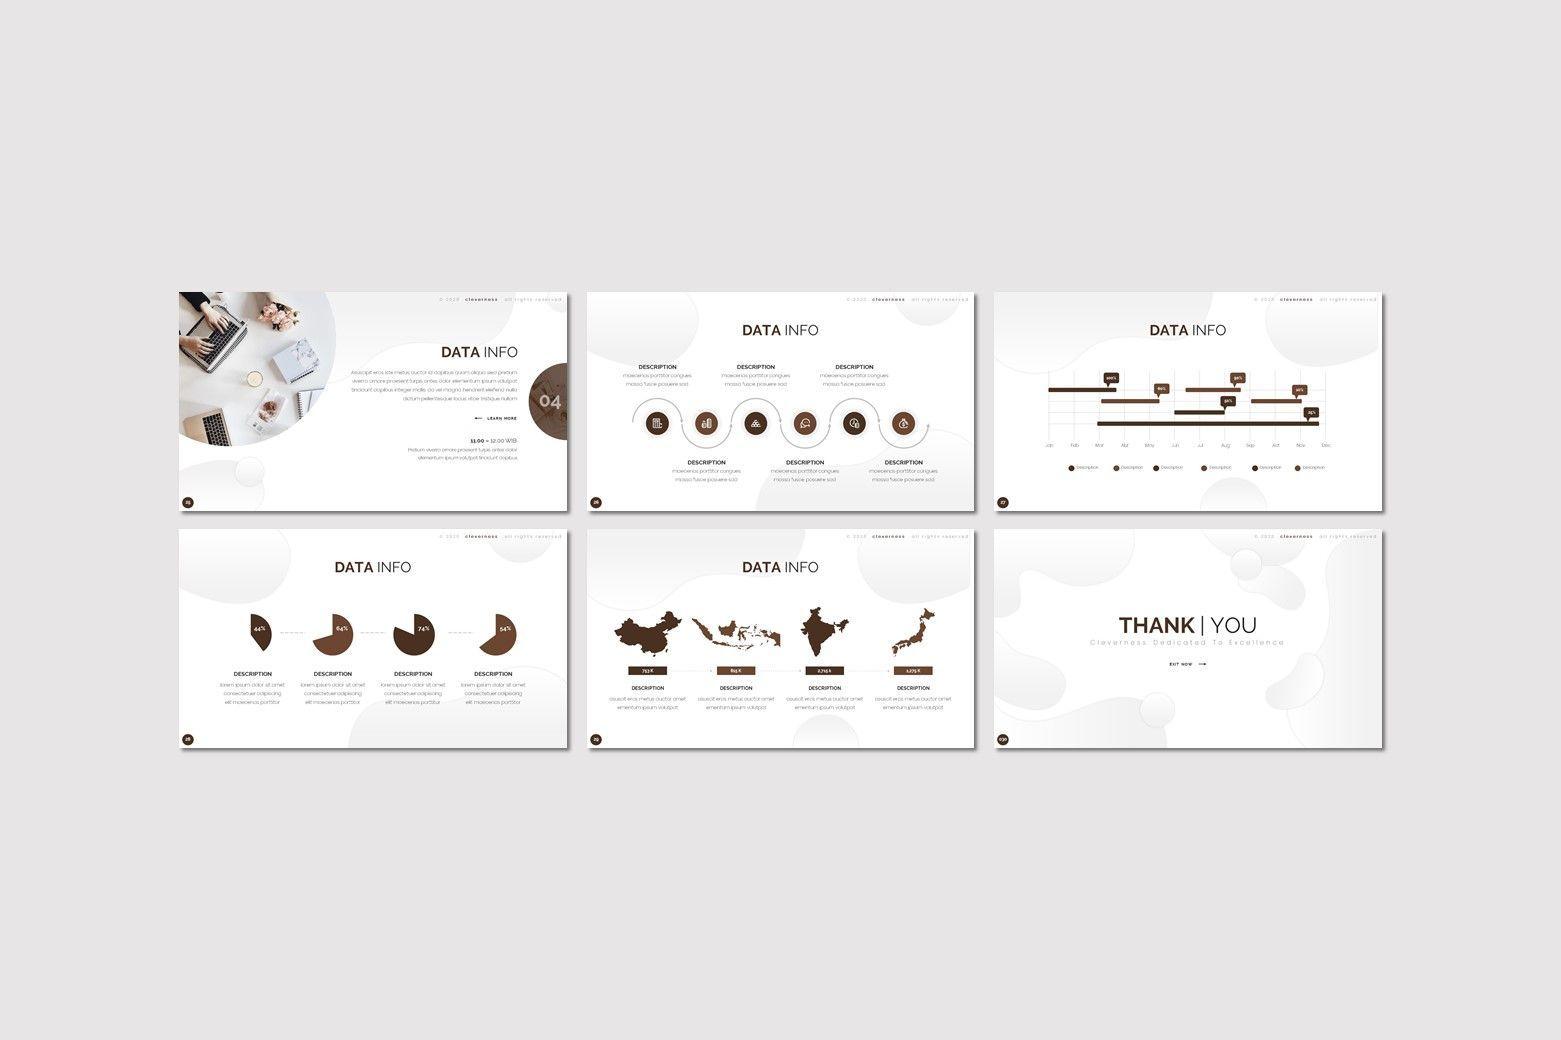 Clevernes - Google Slides Template, Slide 4, 07784, Presentation Templates — PoweredTemplate.com